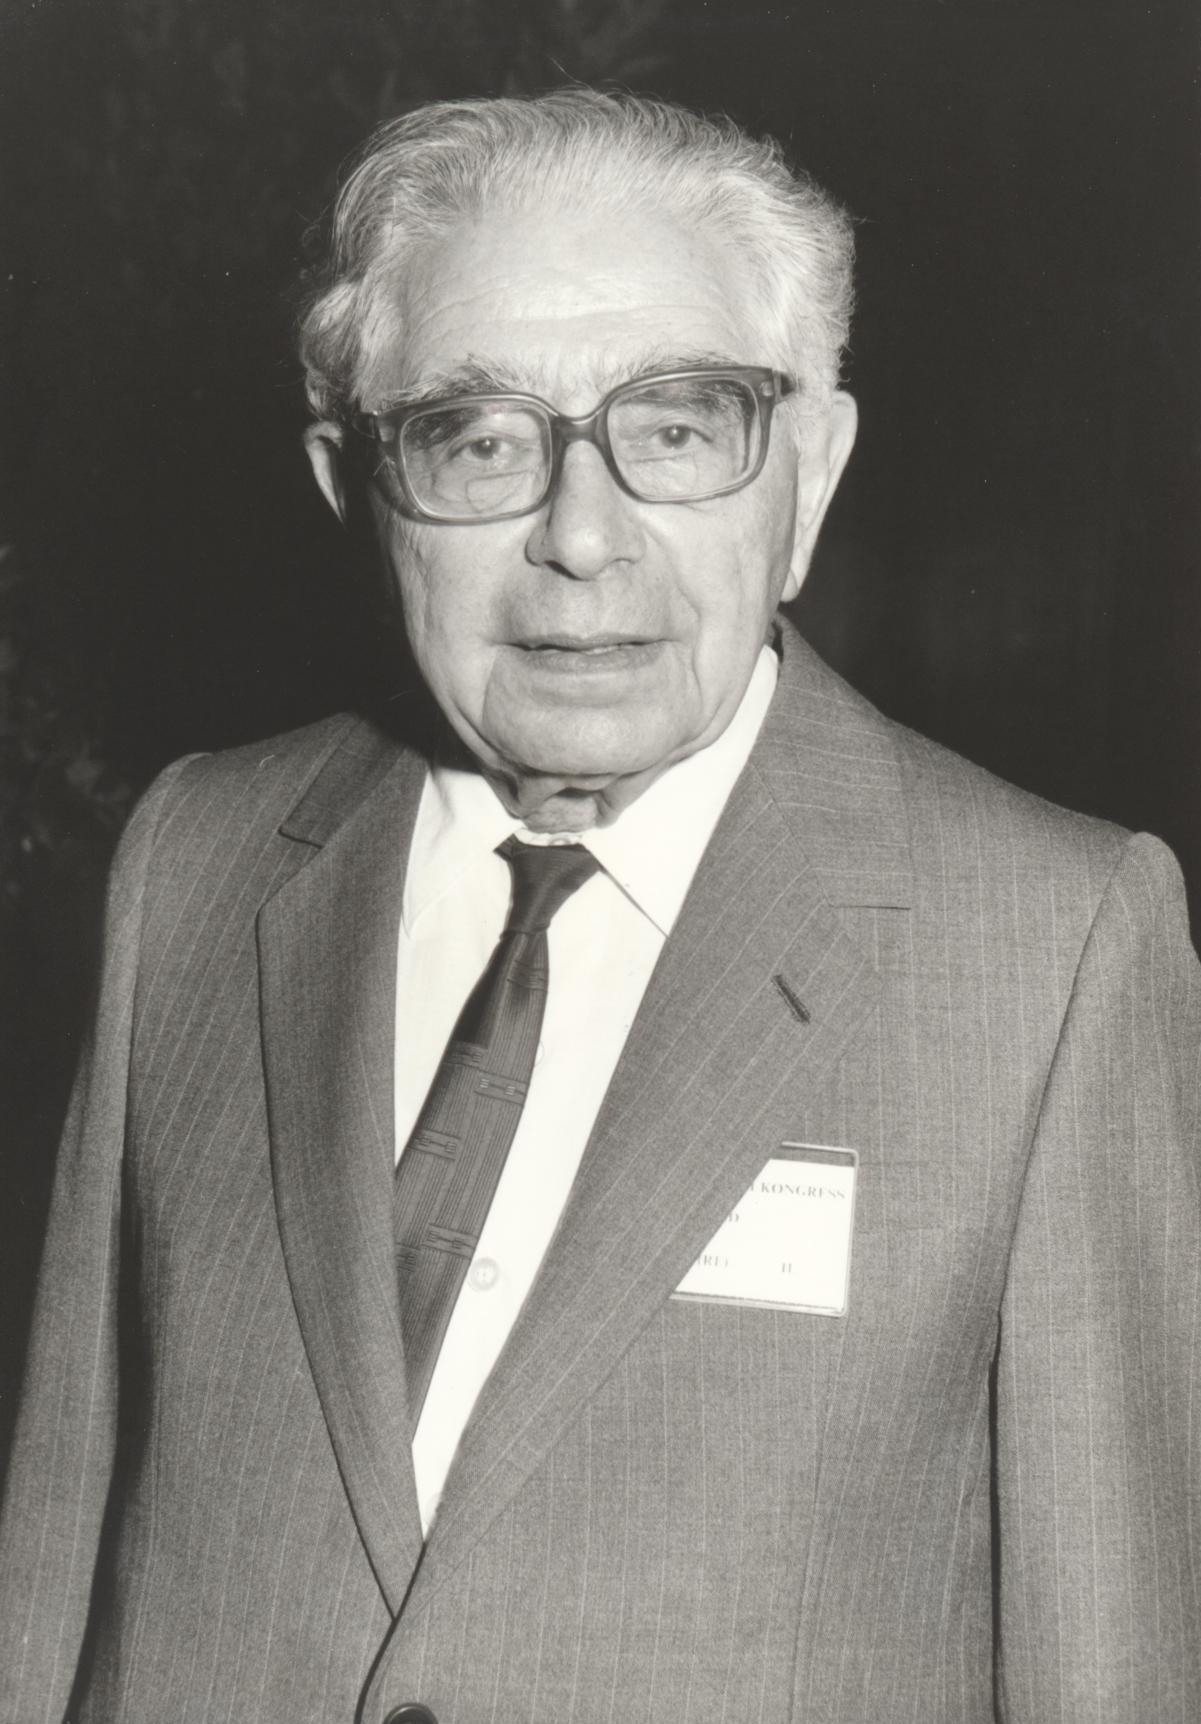 XII. Imago Mundi-Kongress 1989, Innsbruck, Prof. Dr. Friedrich S. Rothschild